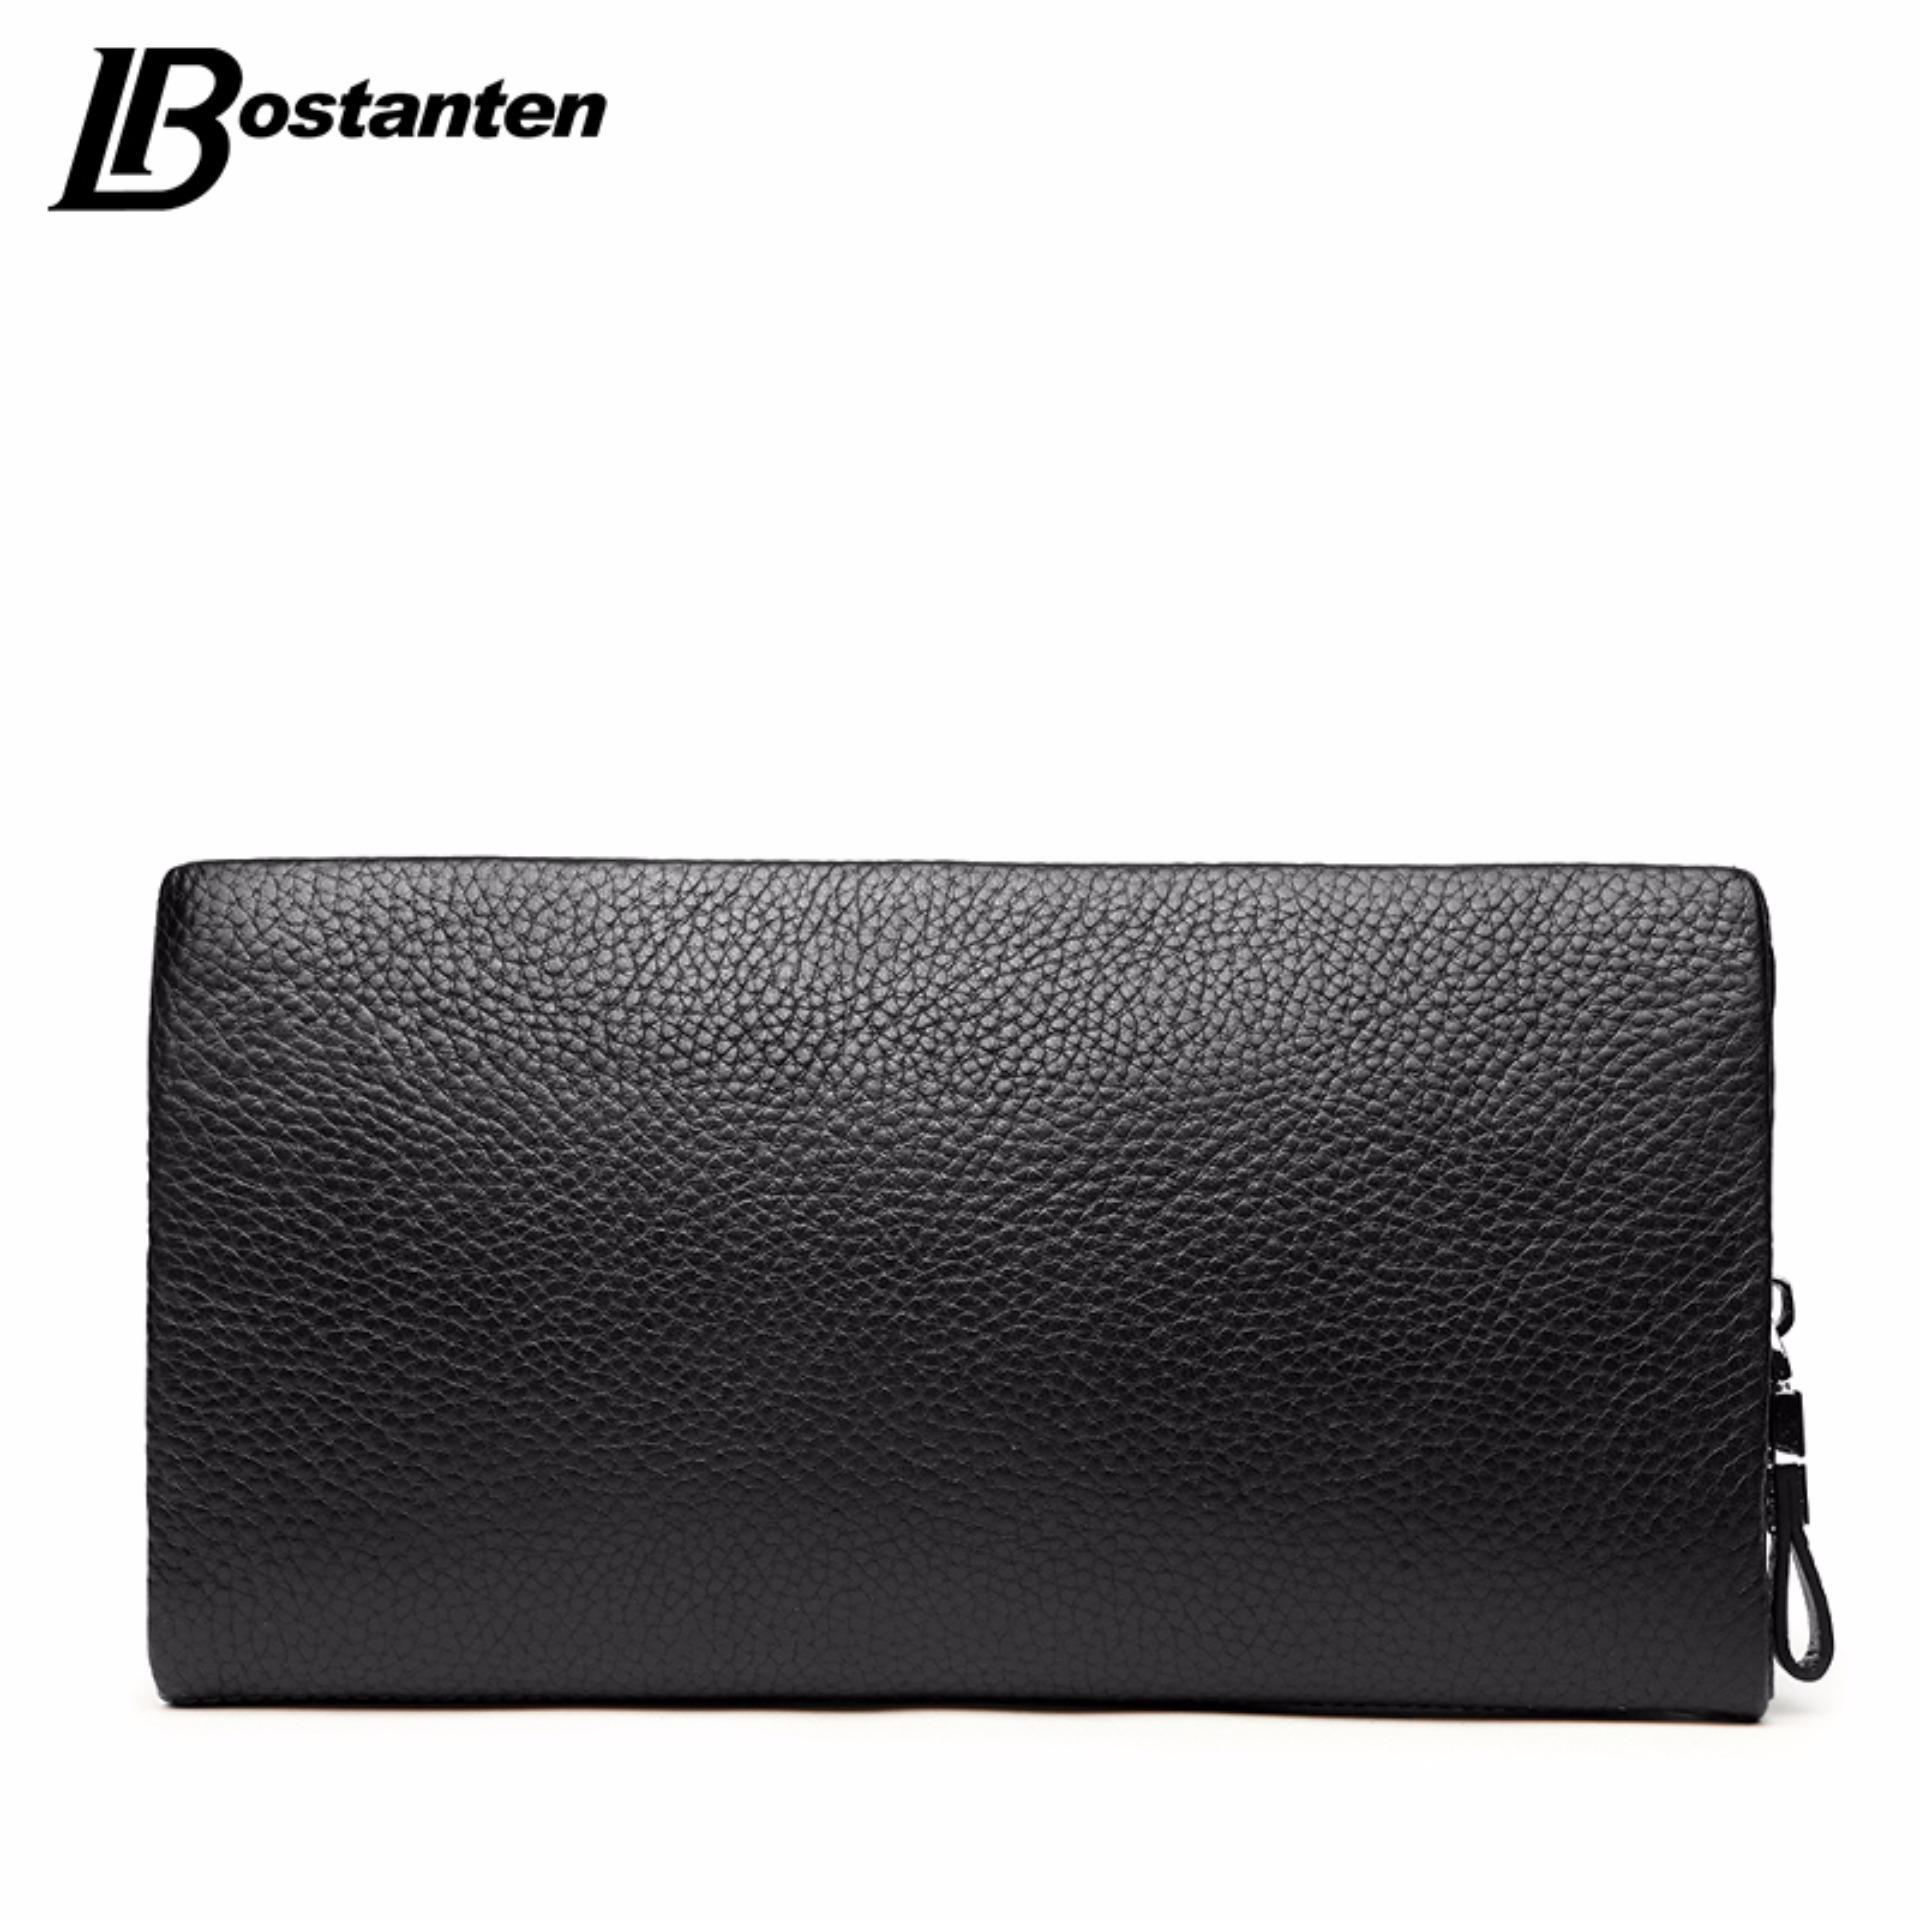 Bostanten Men's Genuine Cowhide Leather Clutch Bag Zipper Wallet Newest 2017 Black -